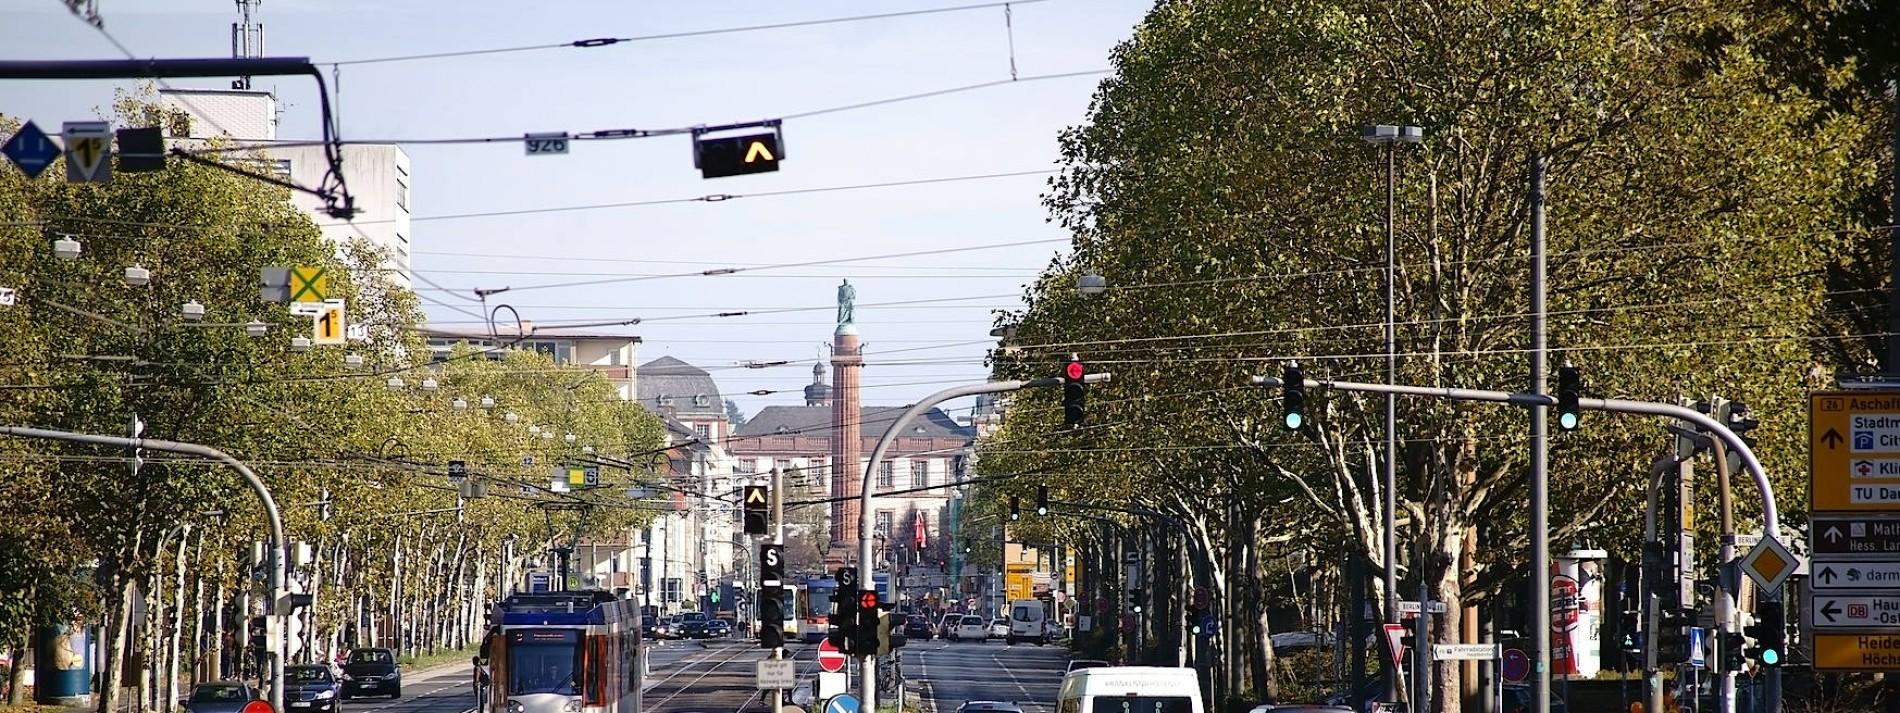 faz.net - Jan Hauser - Smart City: Digitaler Straßenverkehr in Darmstadt